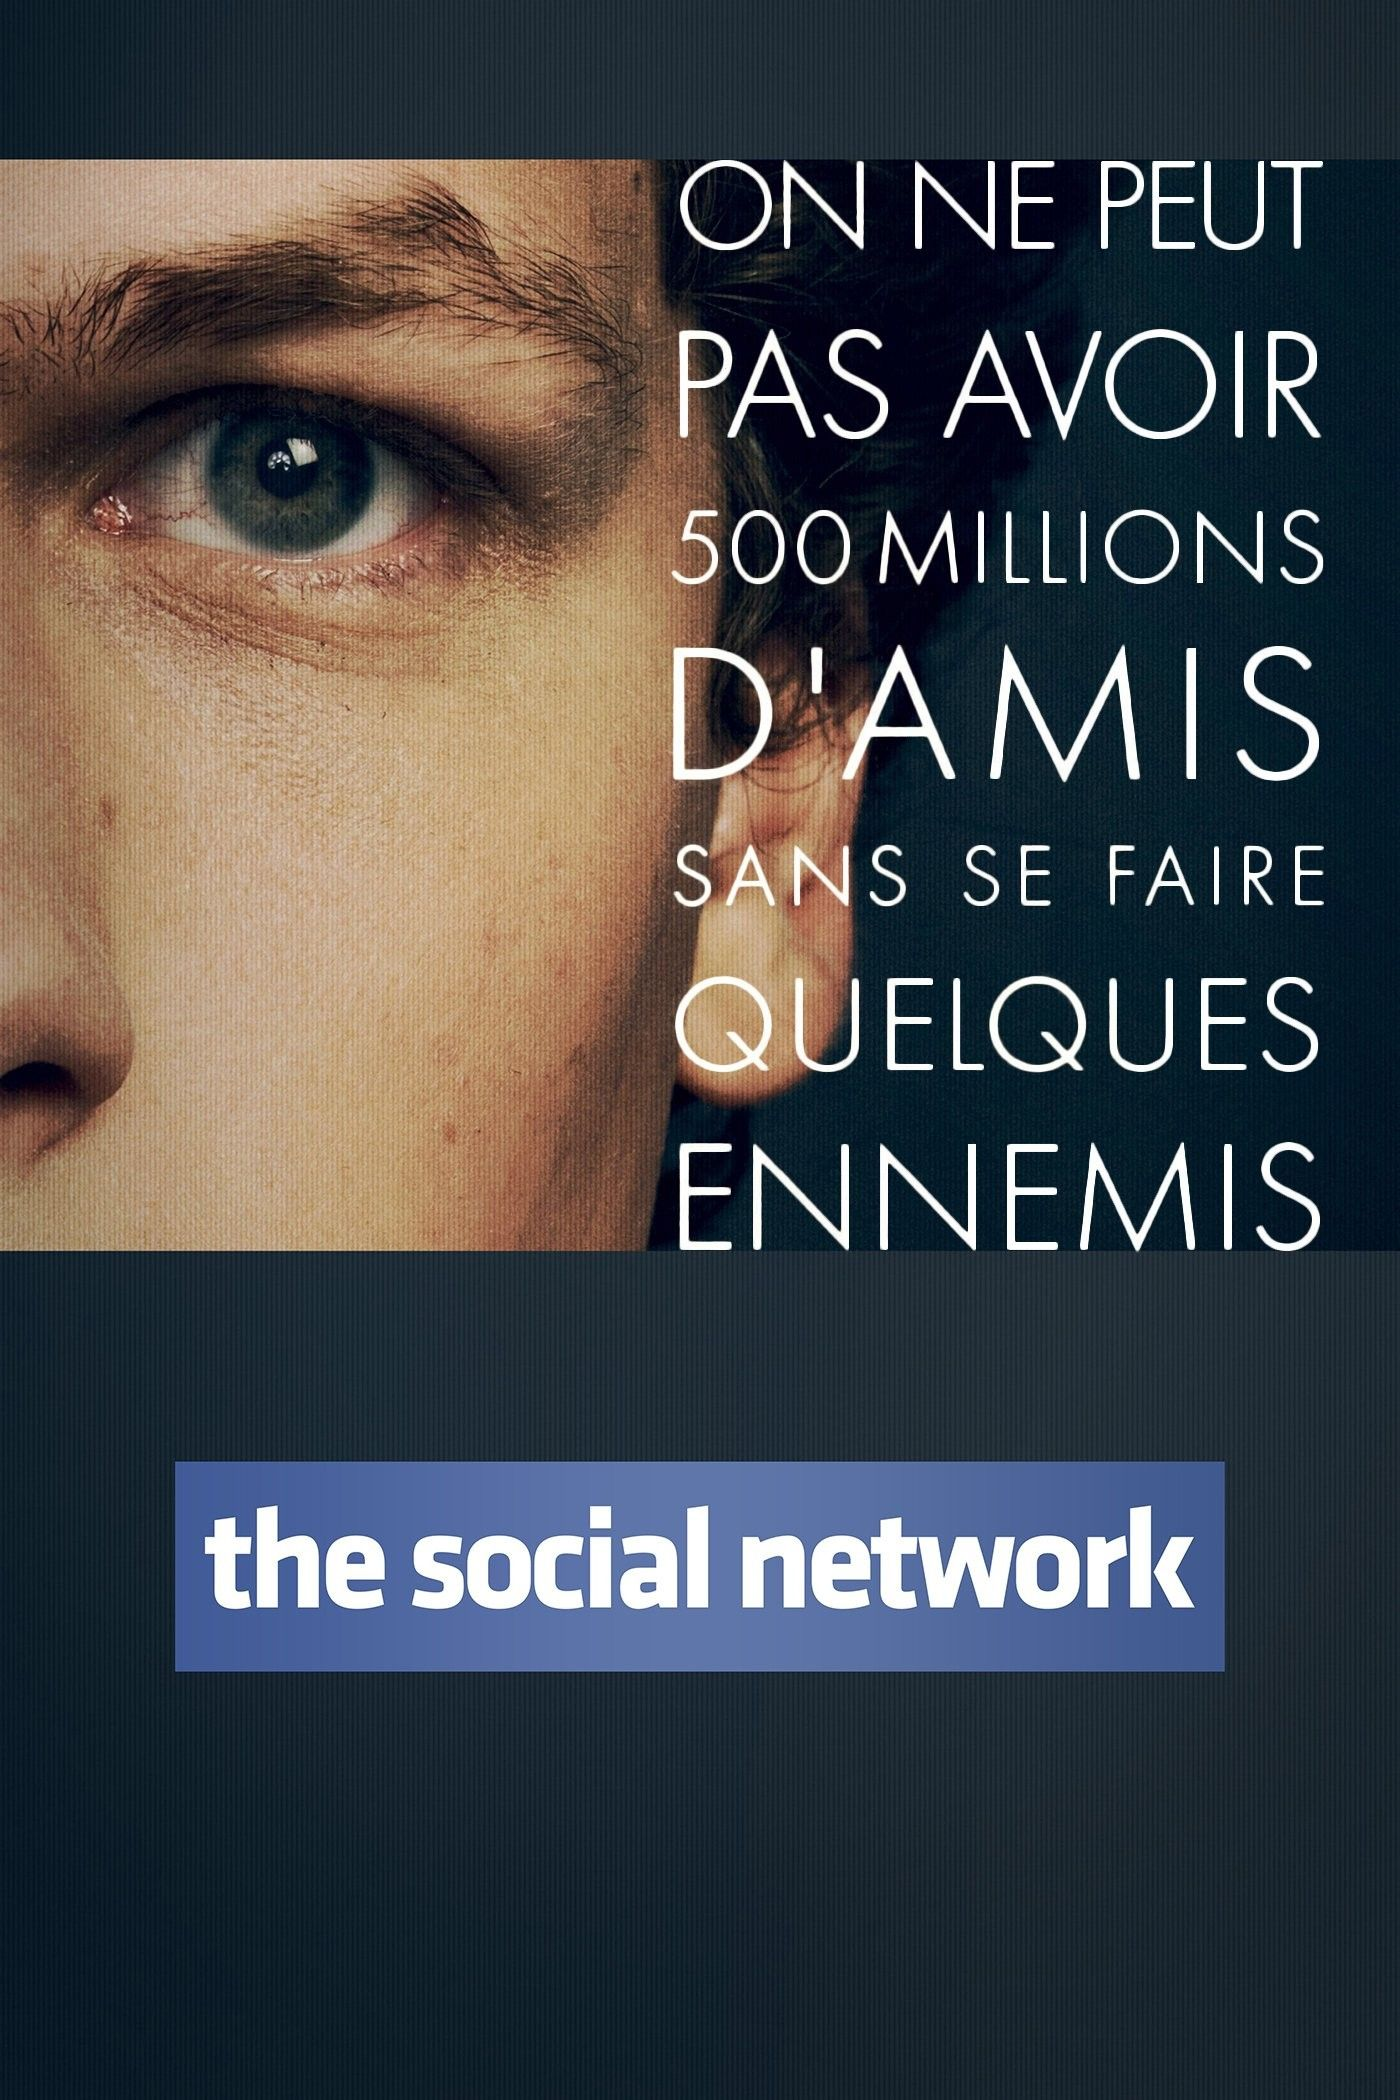 The Social Network (2010) - Regarder Films Gratuit en Ligne - Regarder The Social Network Gratuit en Ligne #TheSocialNetwork - http://mwfo.pro/1475598